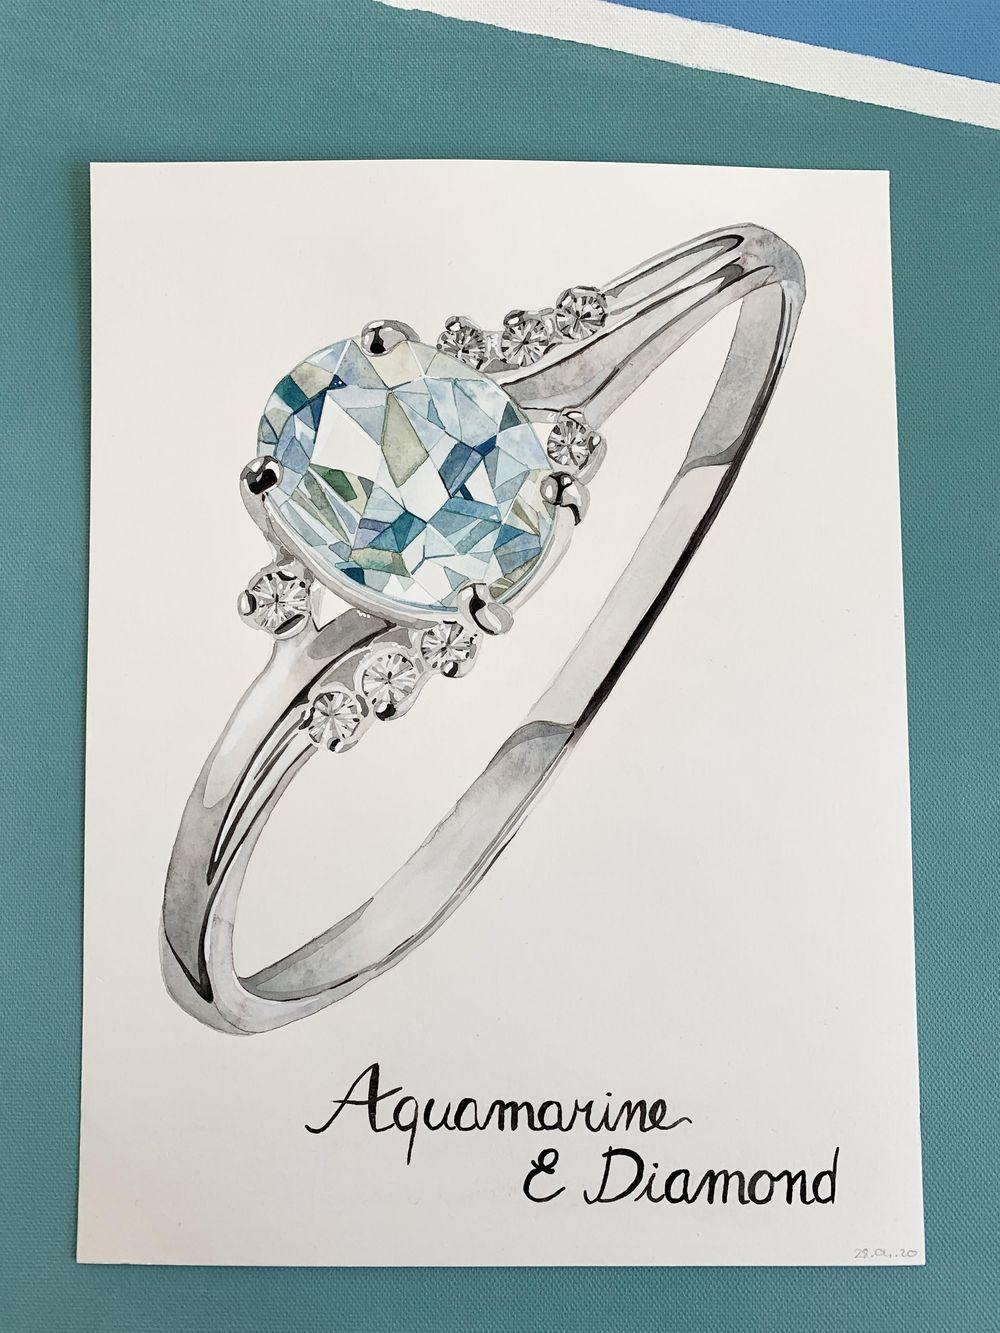 Aquamarine and diamond - image 1 - student project